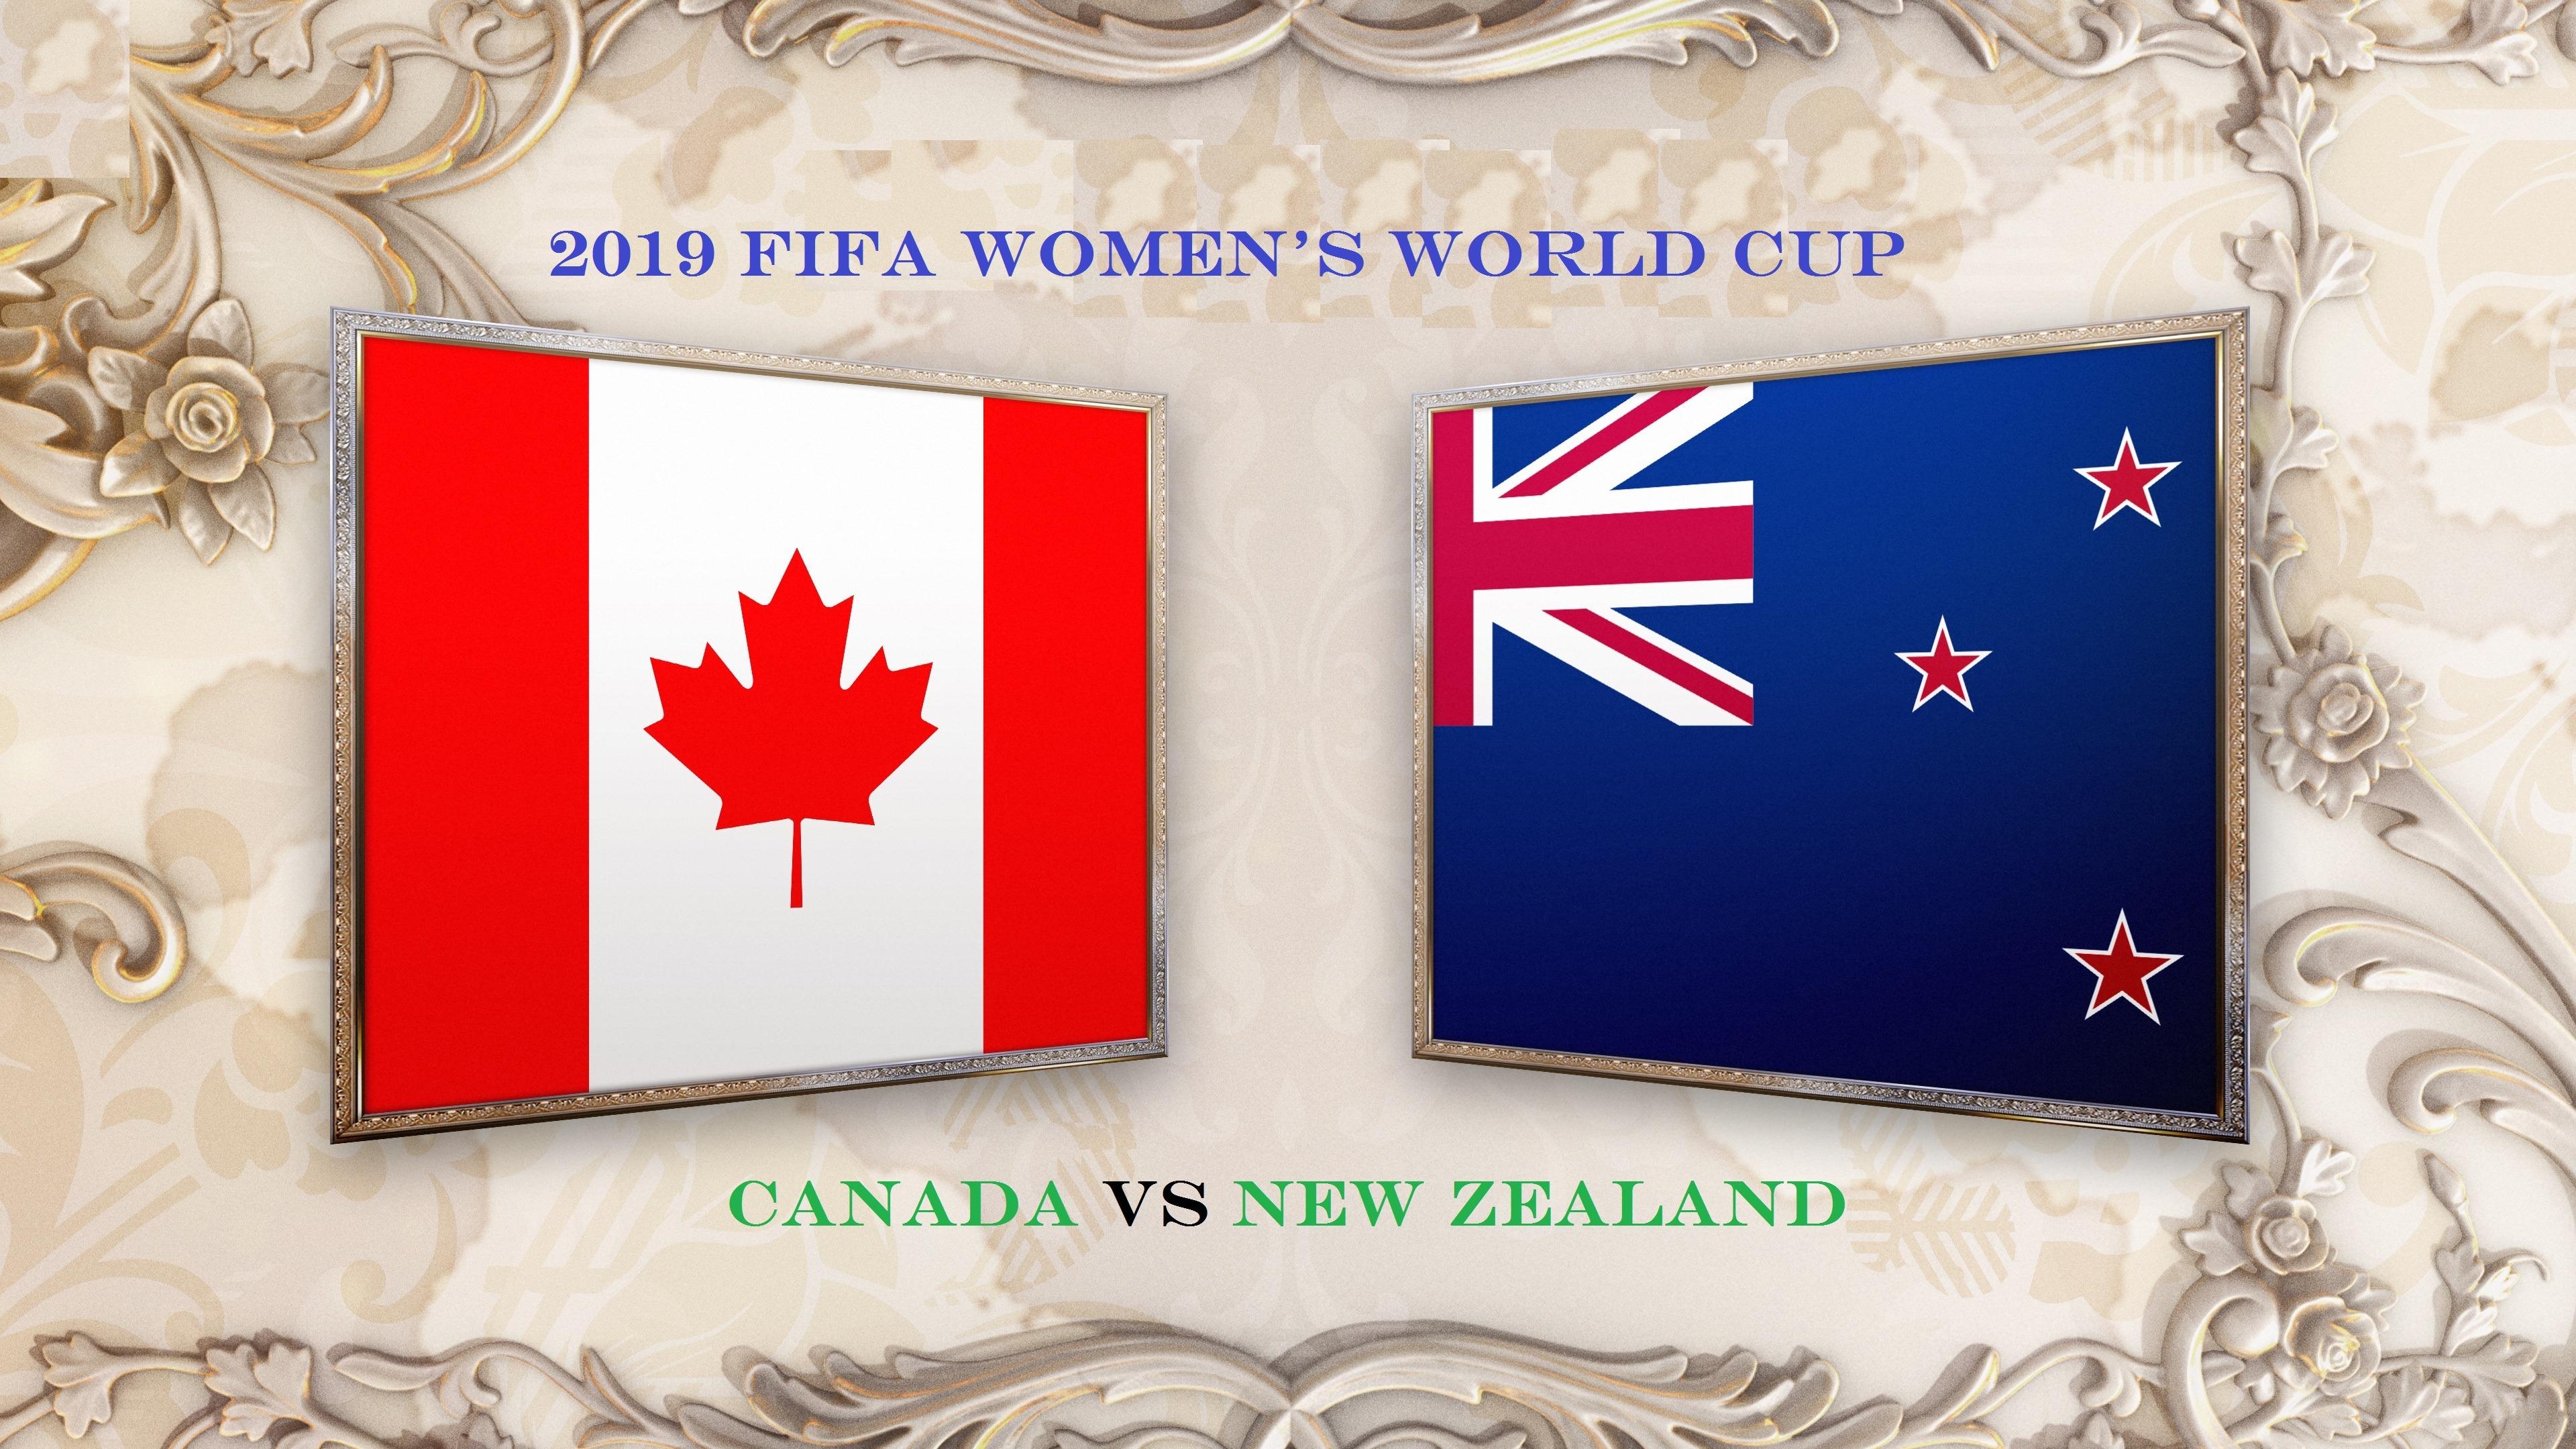 Women's World Cup 2019: Canada vs. New Zealand Live Stream, Prediction, Pick, Match Result